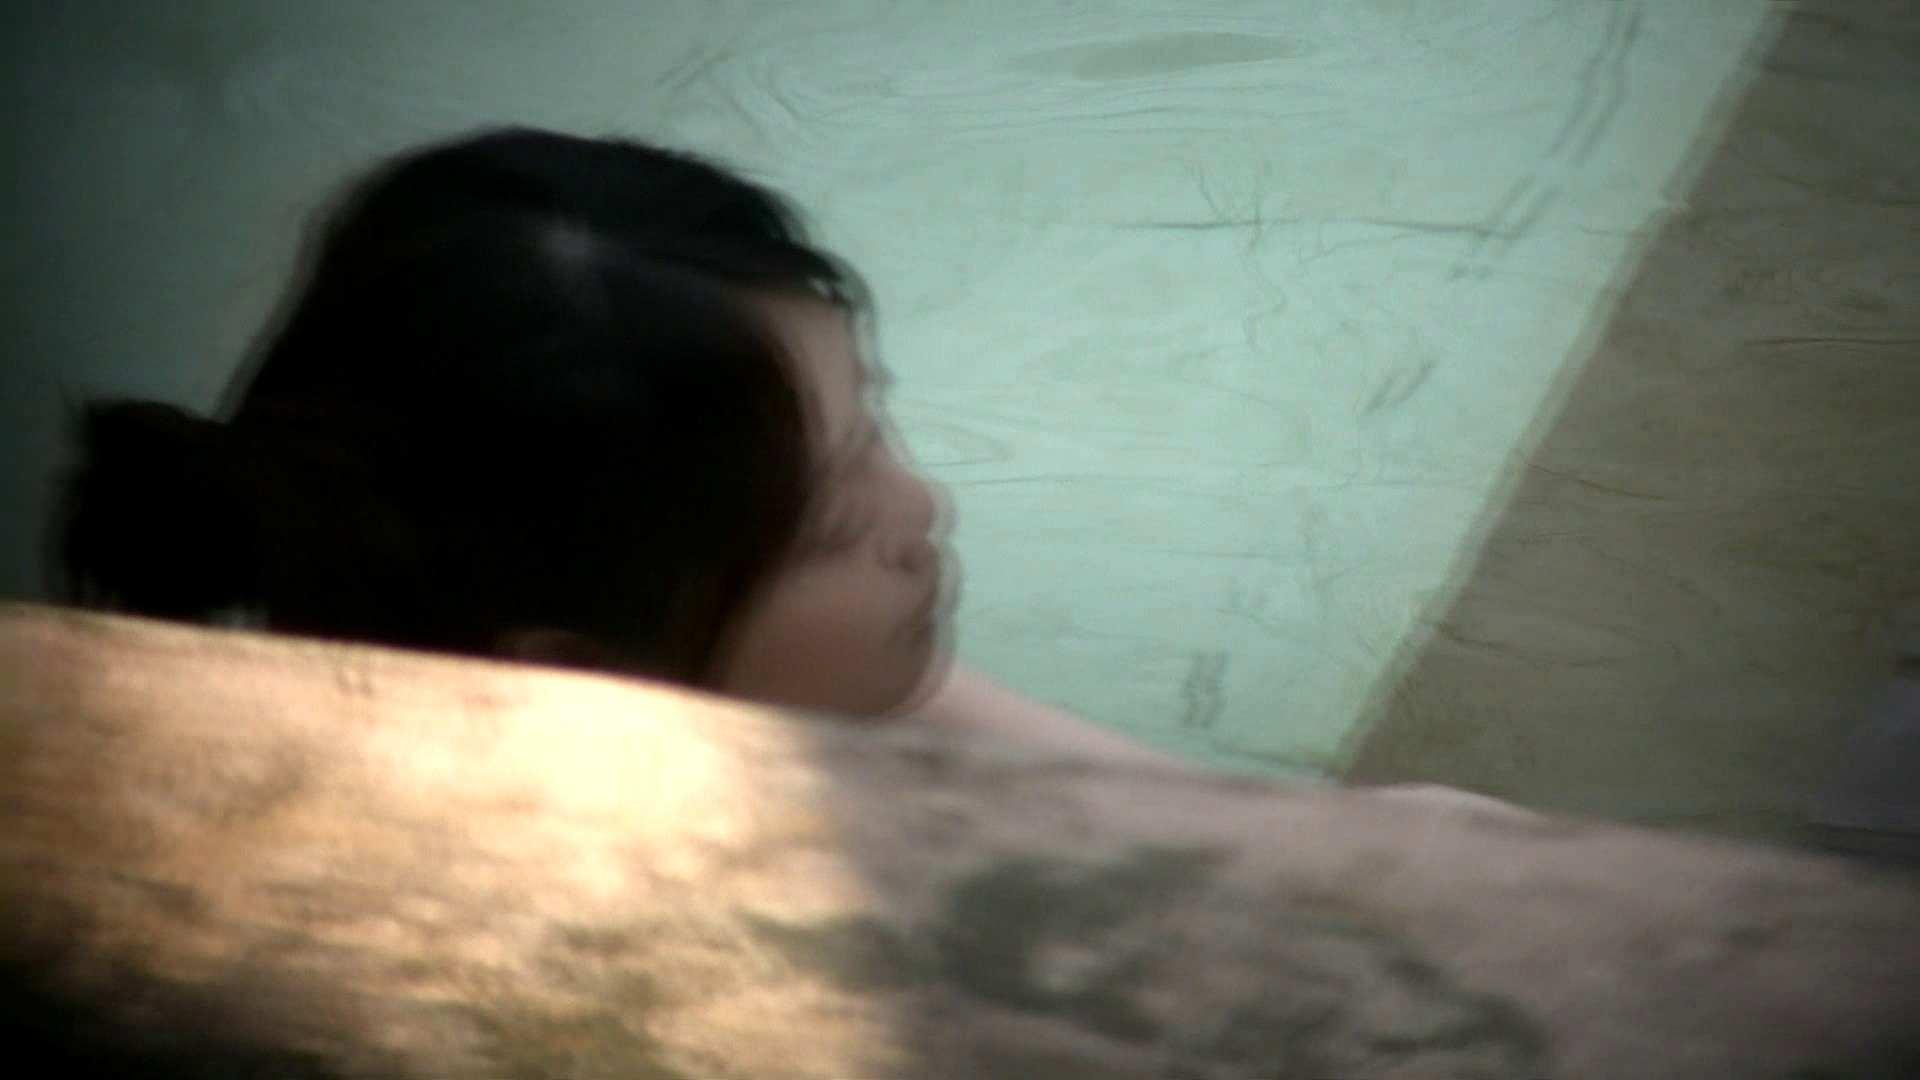 Aquaな露天風呂Vol.652 0   0  41連発 9